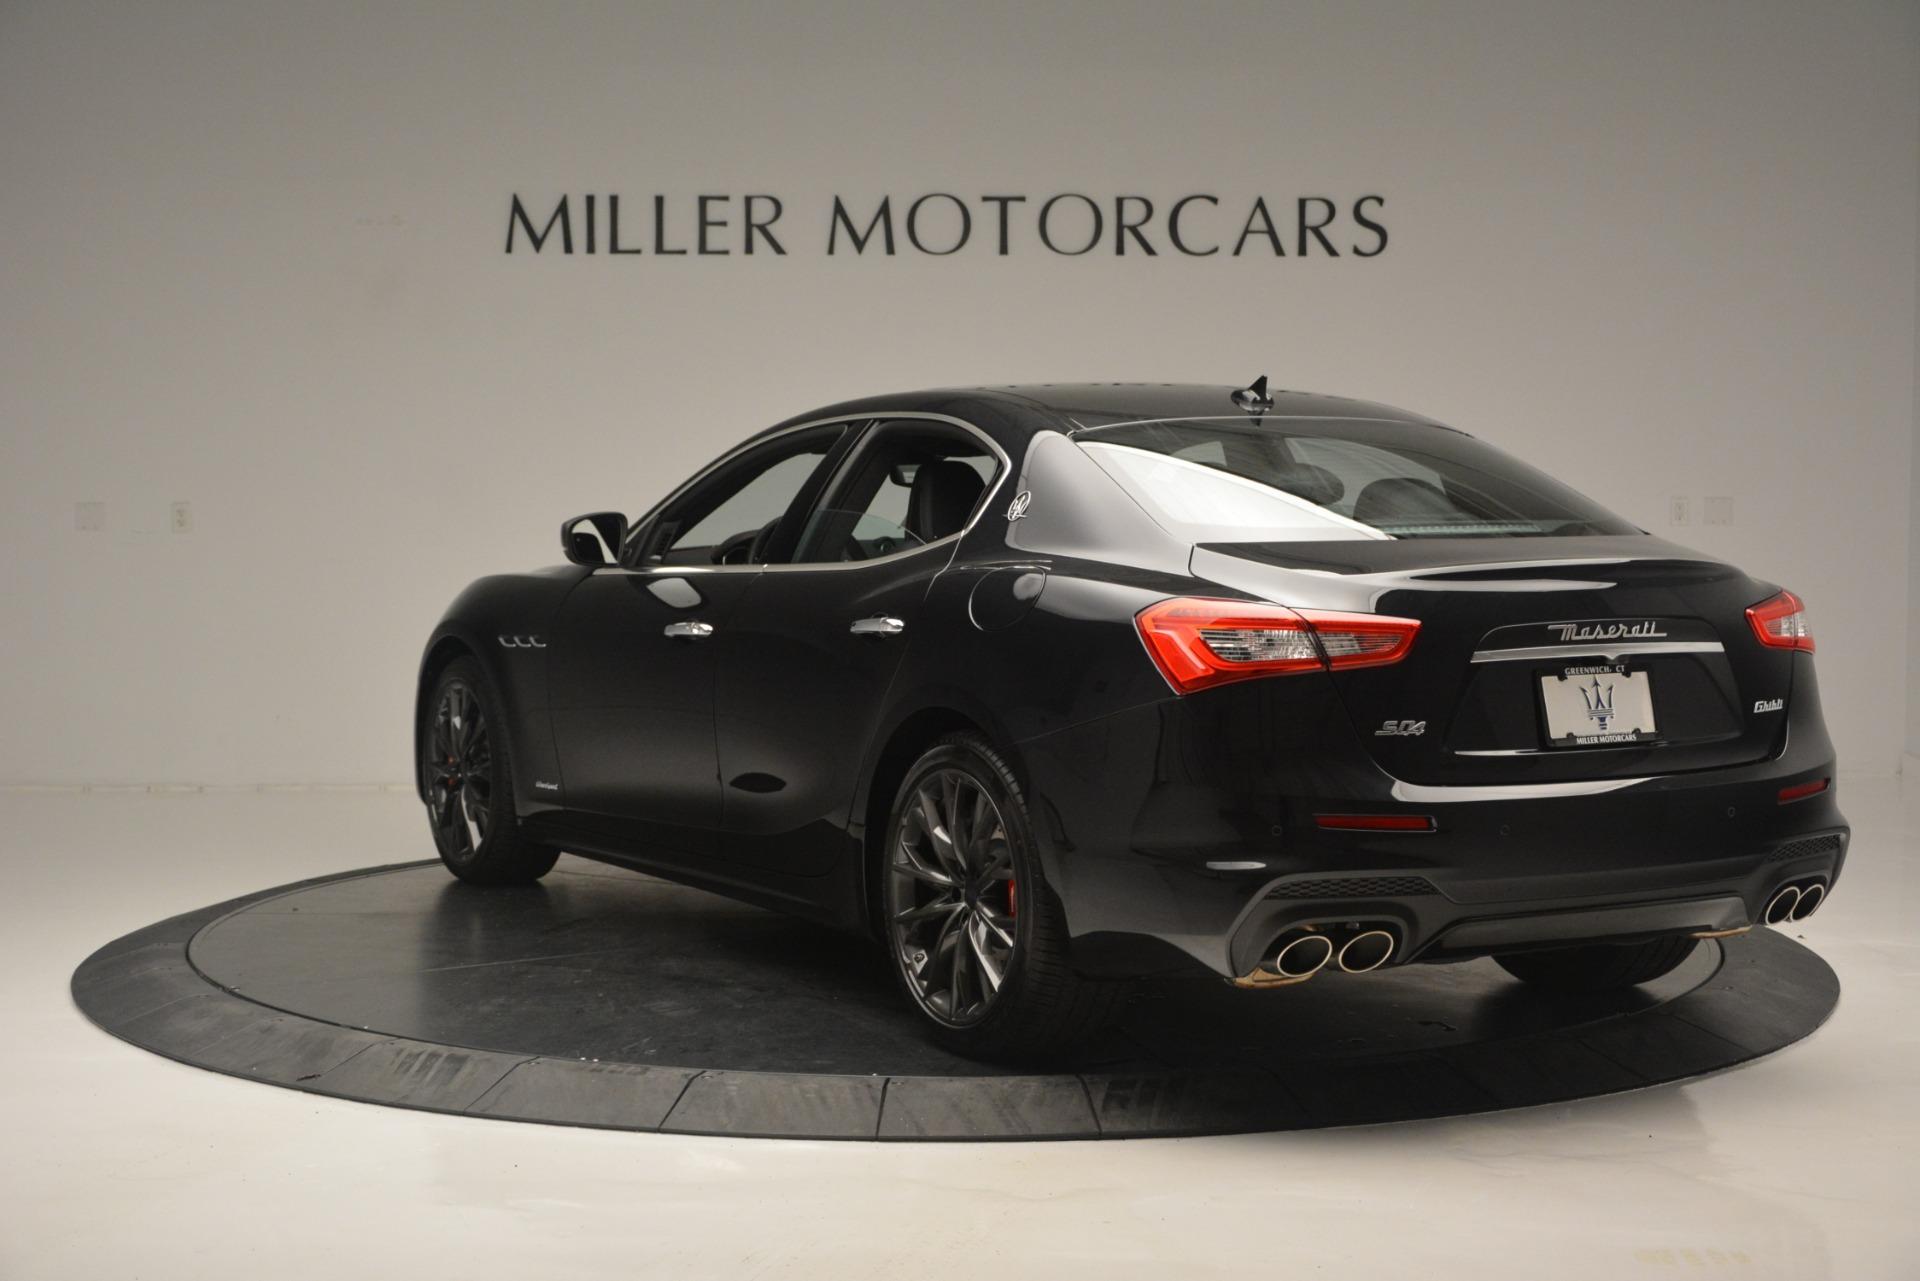 New 2019 Maserati Ghibli S Q4 GranSport For Sale In Greenwich, CT 2588_p5